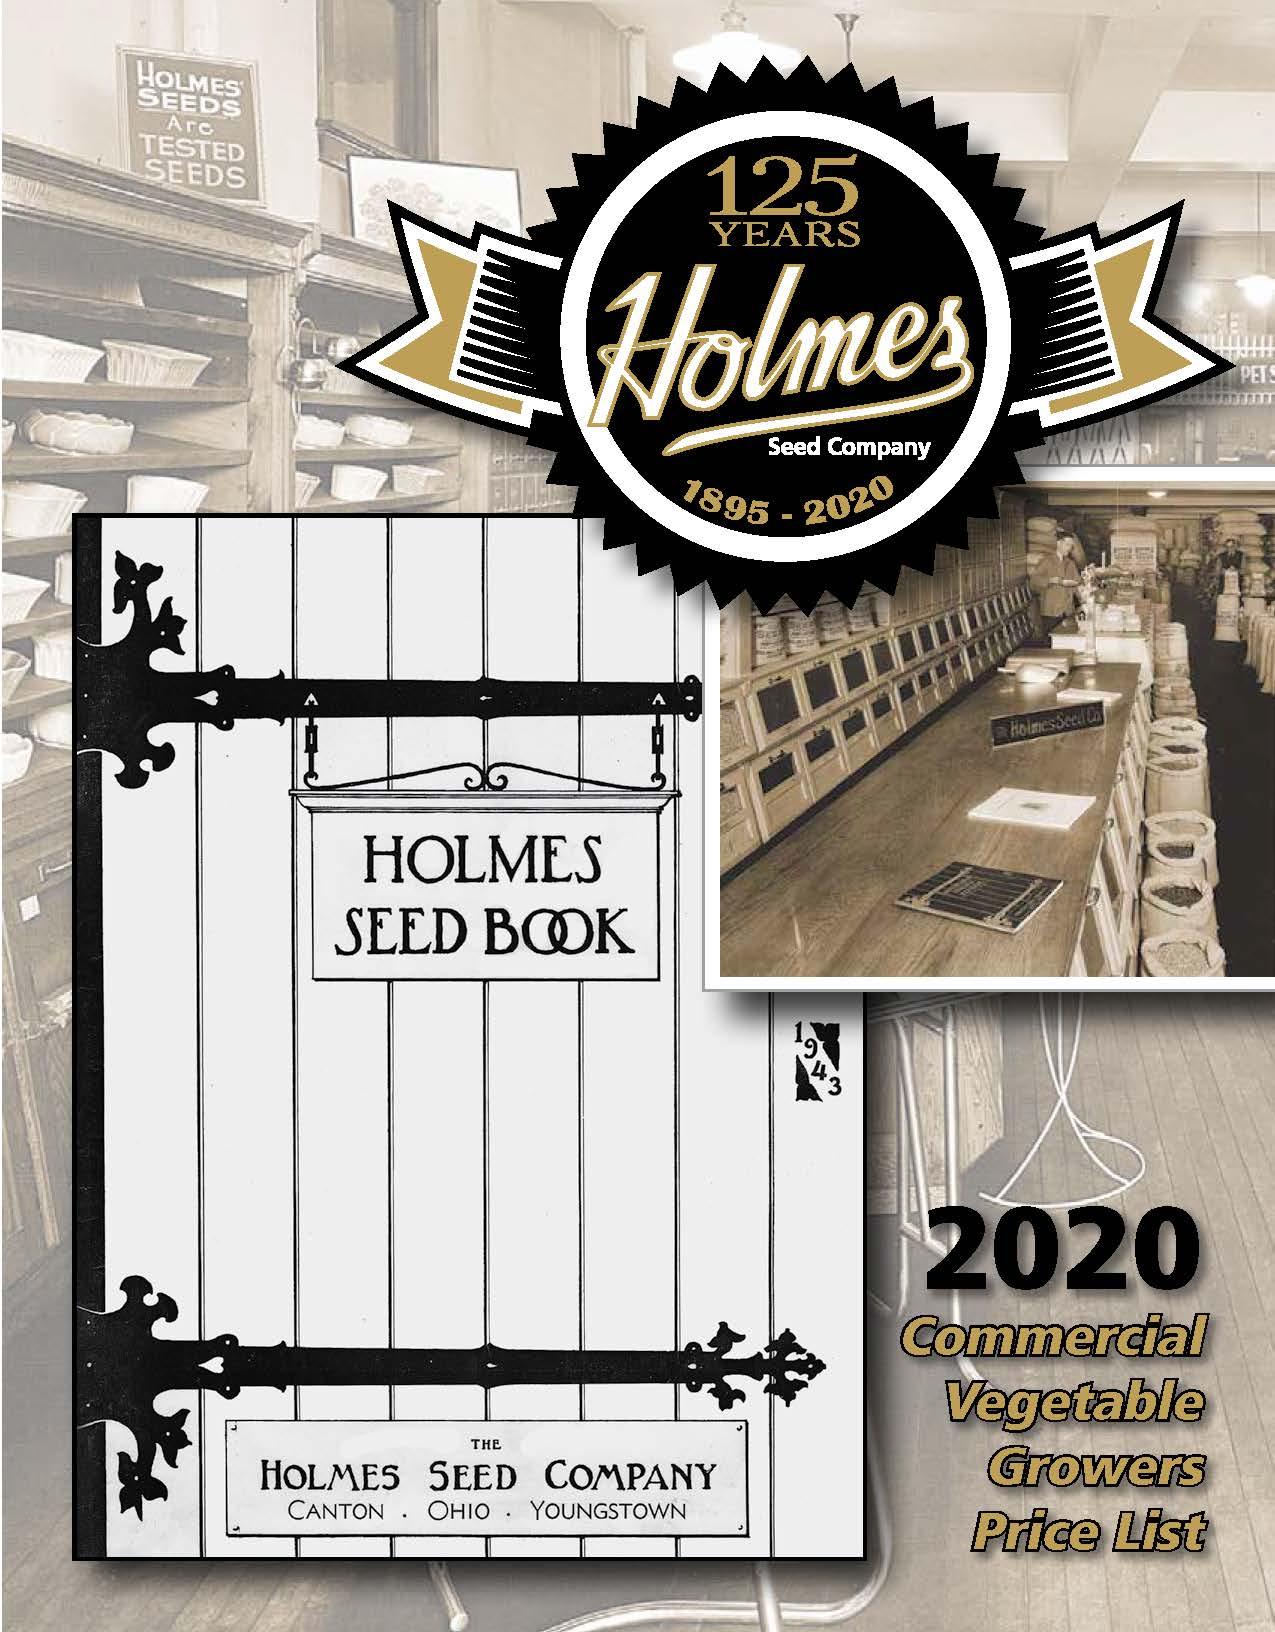 2020-holmes-seed-catalog-cover.jpg